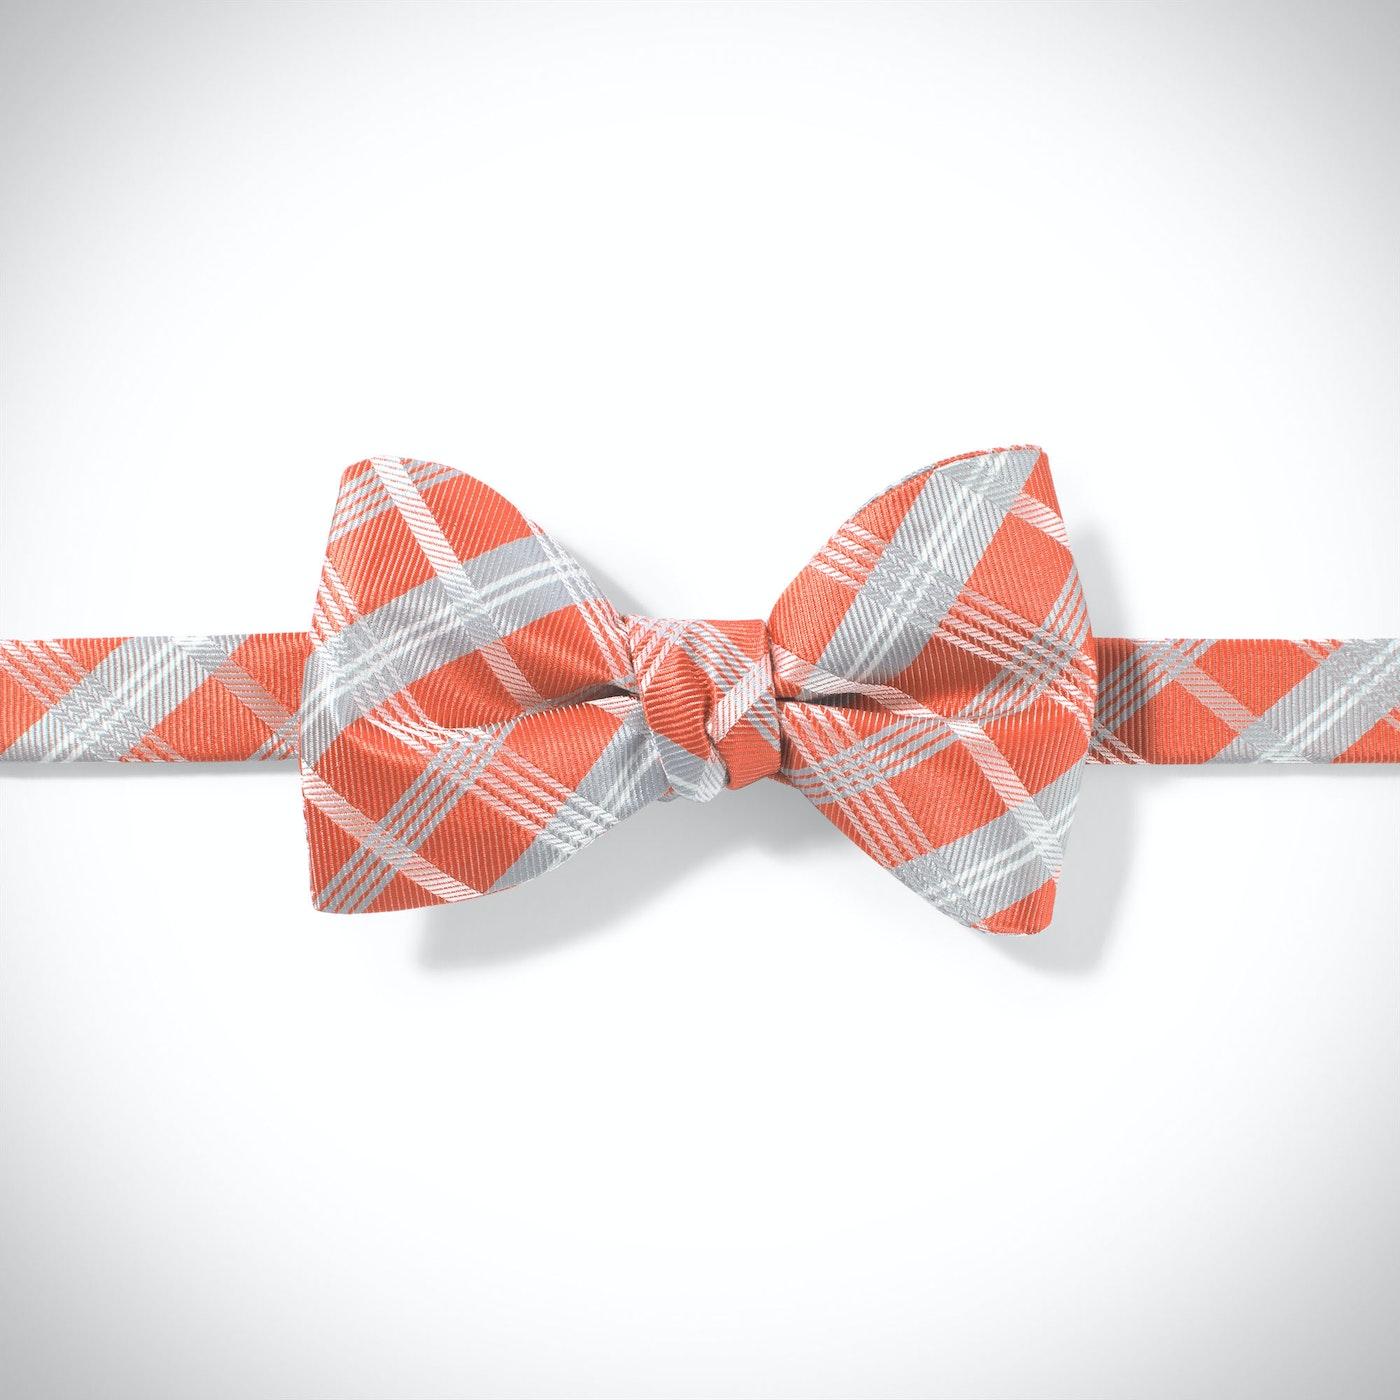 Dark Orange Plaid Pre-Tied Bow Tie